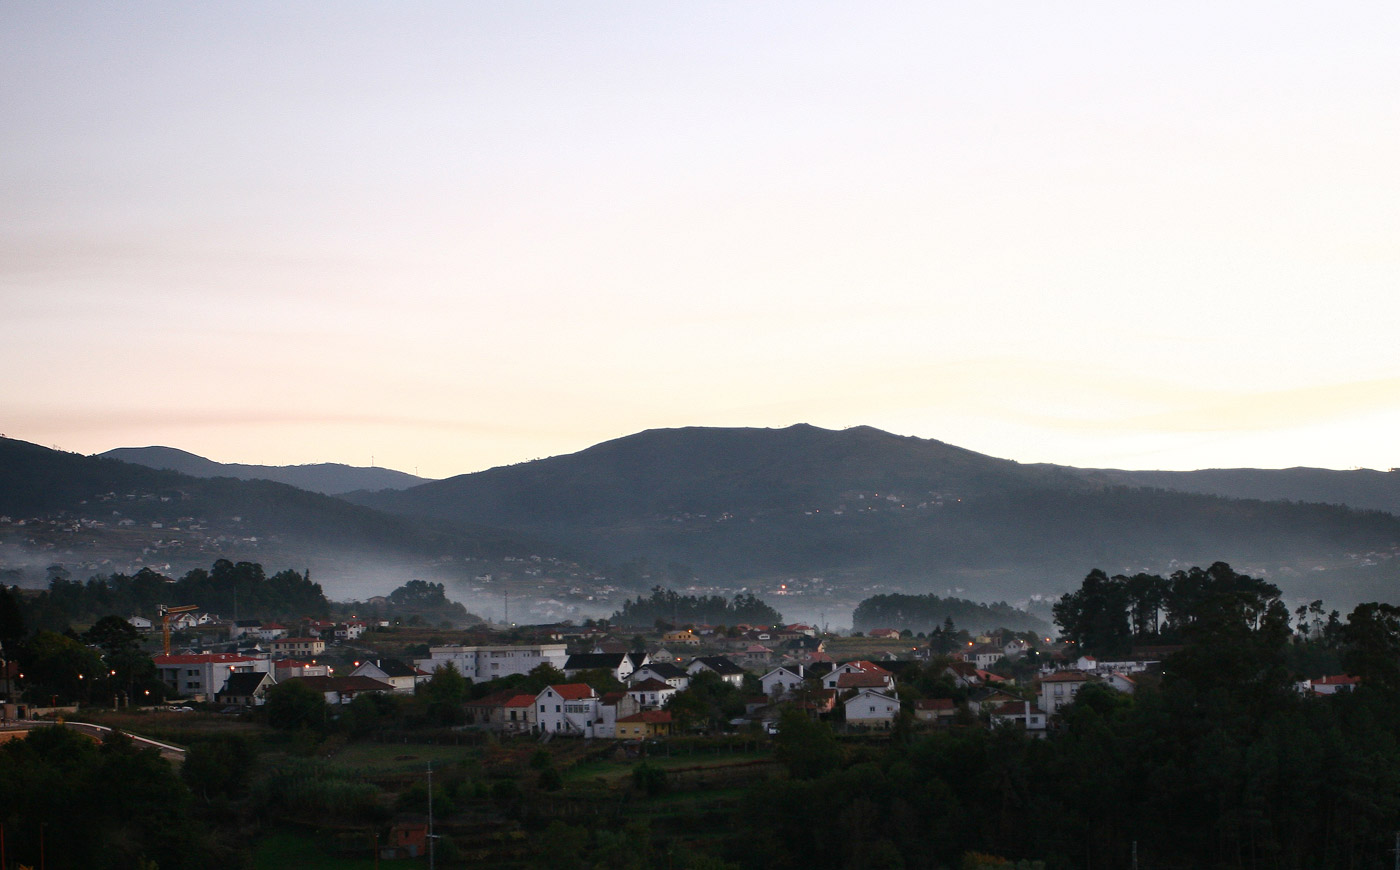 Mists in Melgaco, Minho